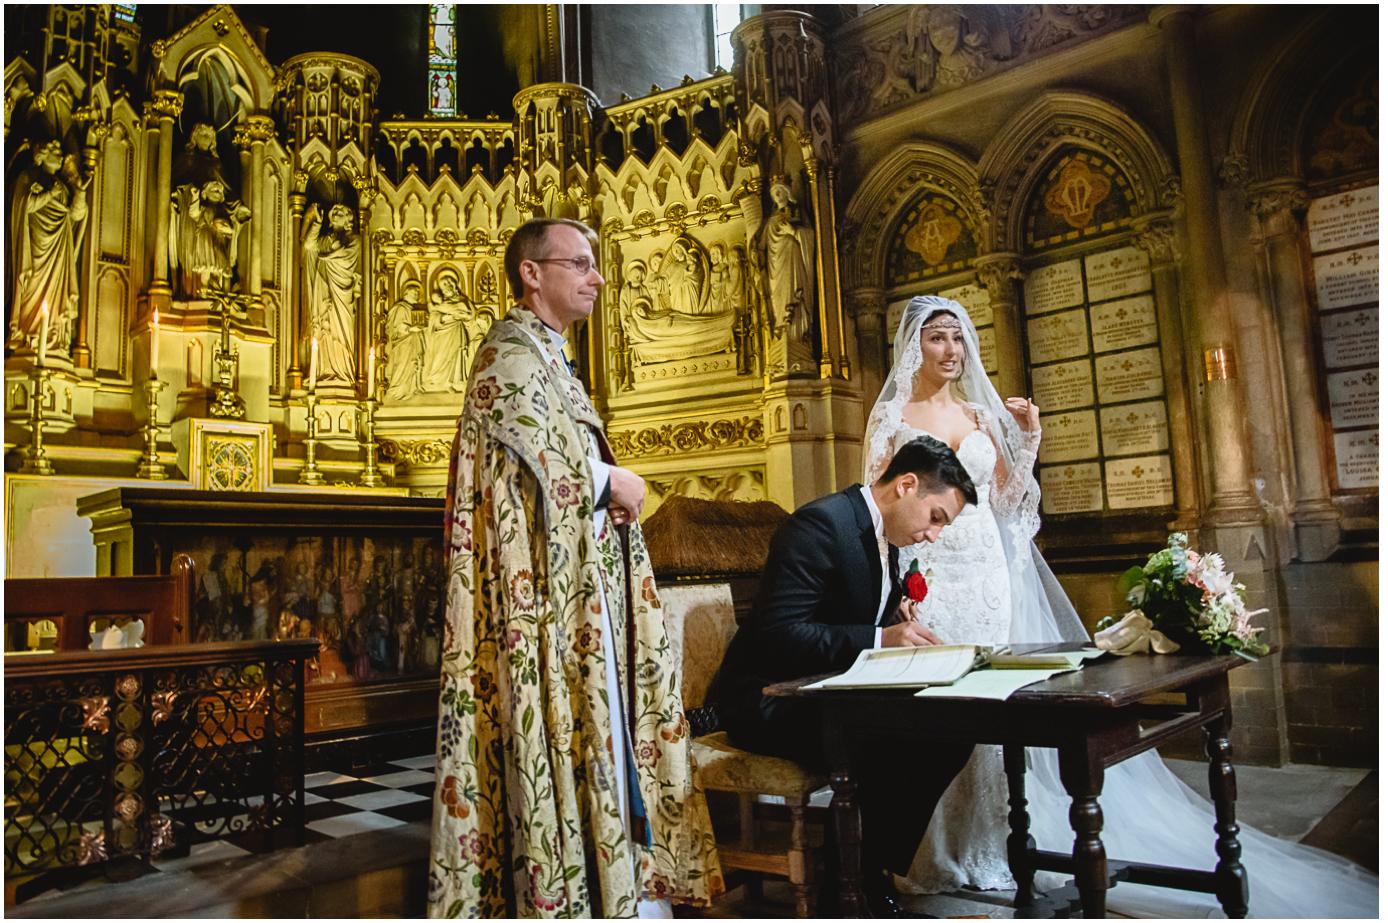 iranian wedding photographer 88 - Drapers Hall London Wedding Photographer